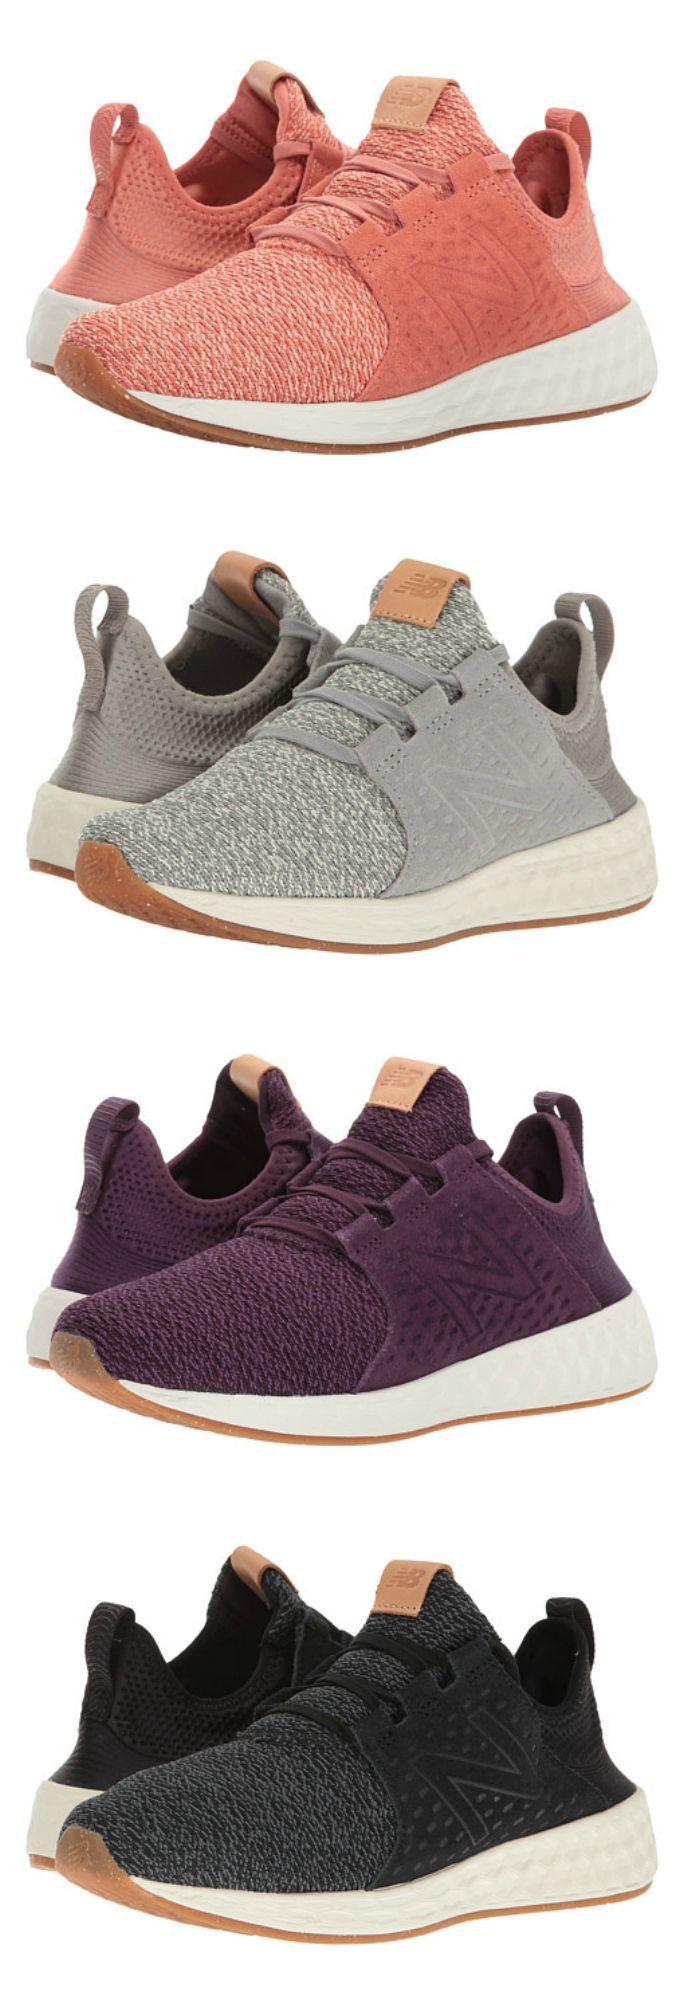 New Balance - Fresh Foam Cruz v1 Womens Running Shoes via Zappos